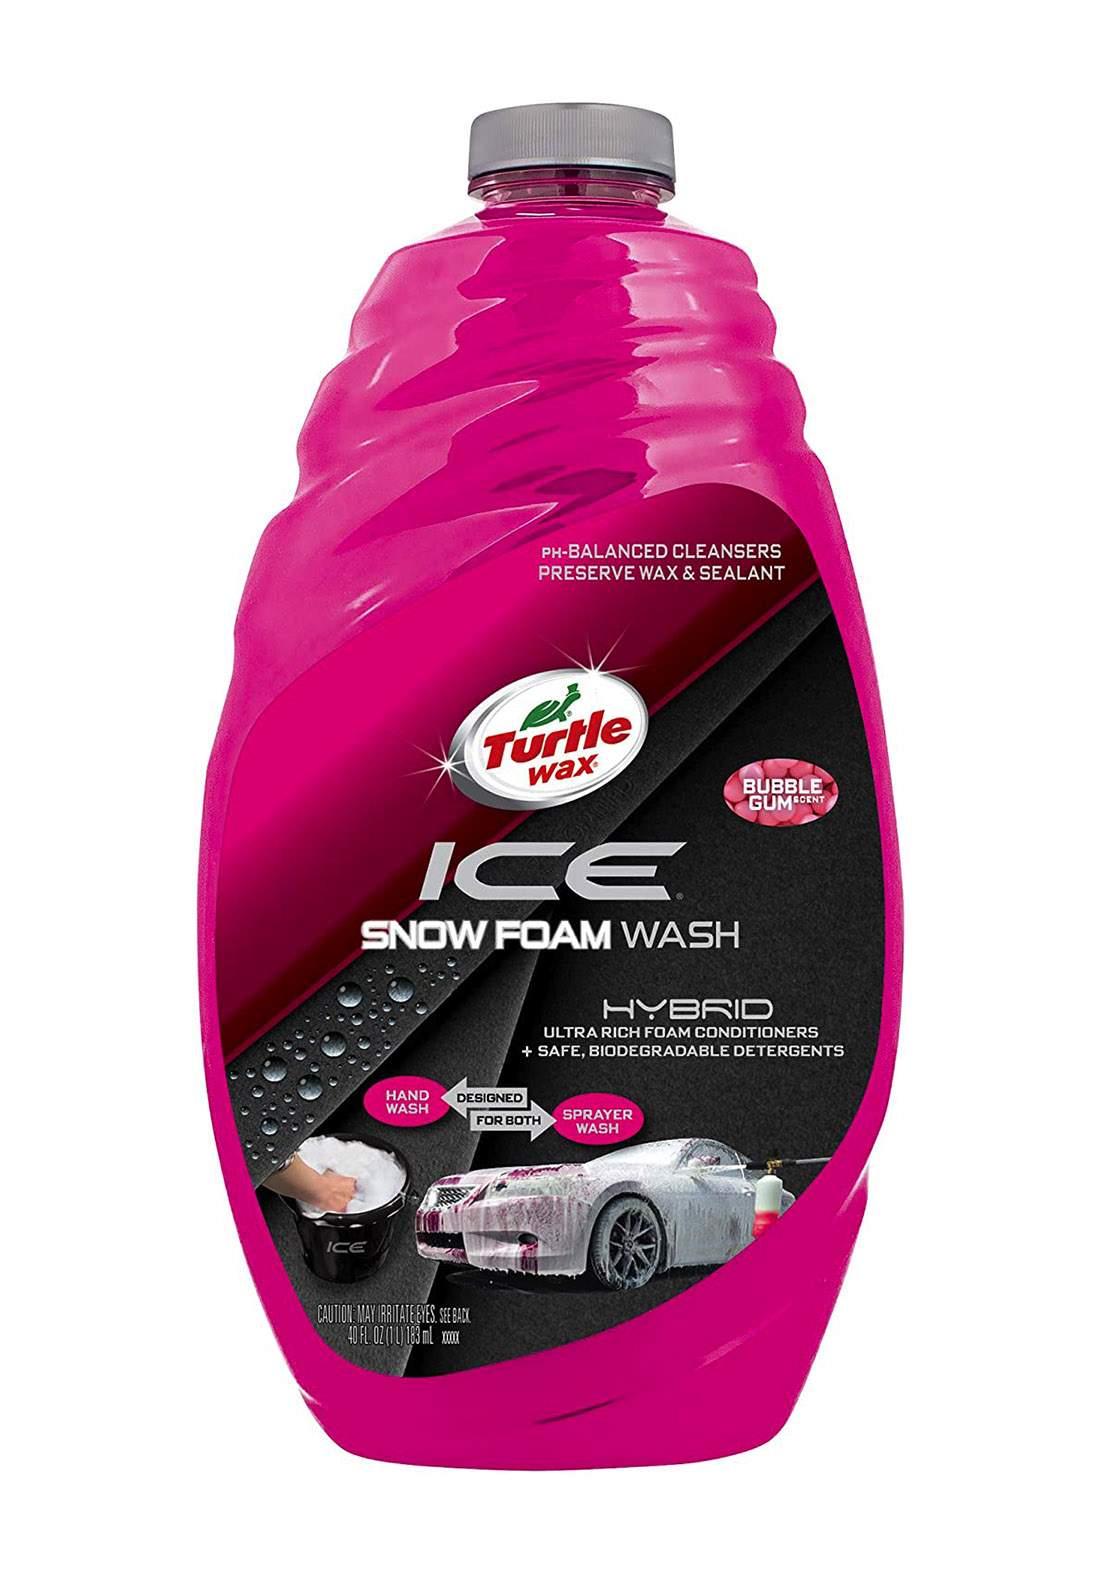 Turtle Wax Ice Snow Foam wash Car Washing Liquid 180 ml  غسول للسيارة